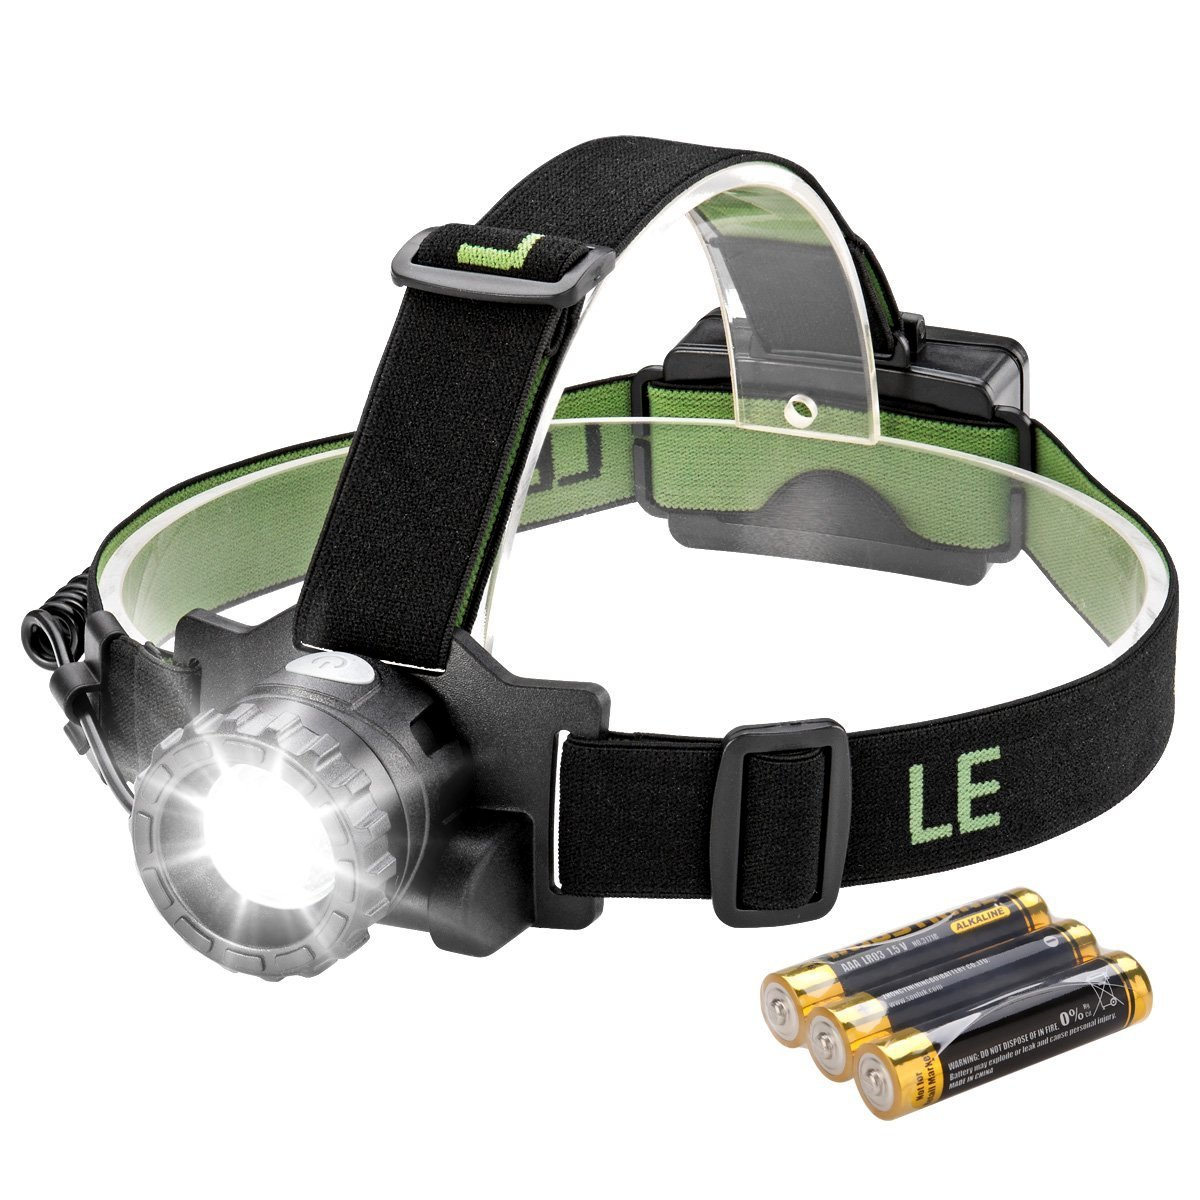 LE Linterna frontal USB LED Potente 1150lm, con Luz trasera Roja, 3 modos, Función de Zoom, Cabezal Ligero, cable USB incluido, ideal para deporte nocturno, correr, caminar [Clase de eficiencia energética A+] Lighting EVER